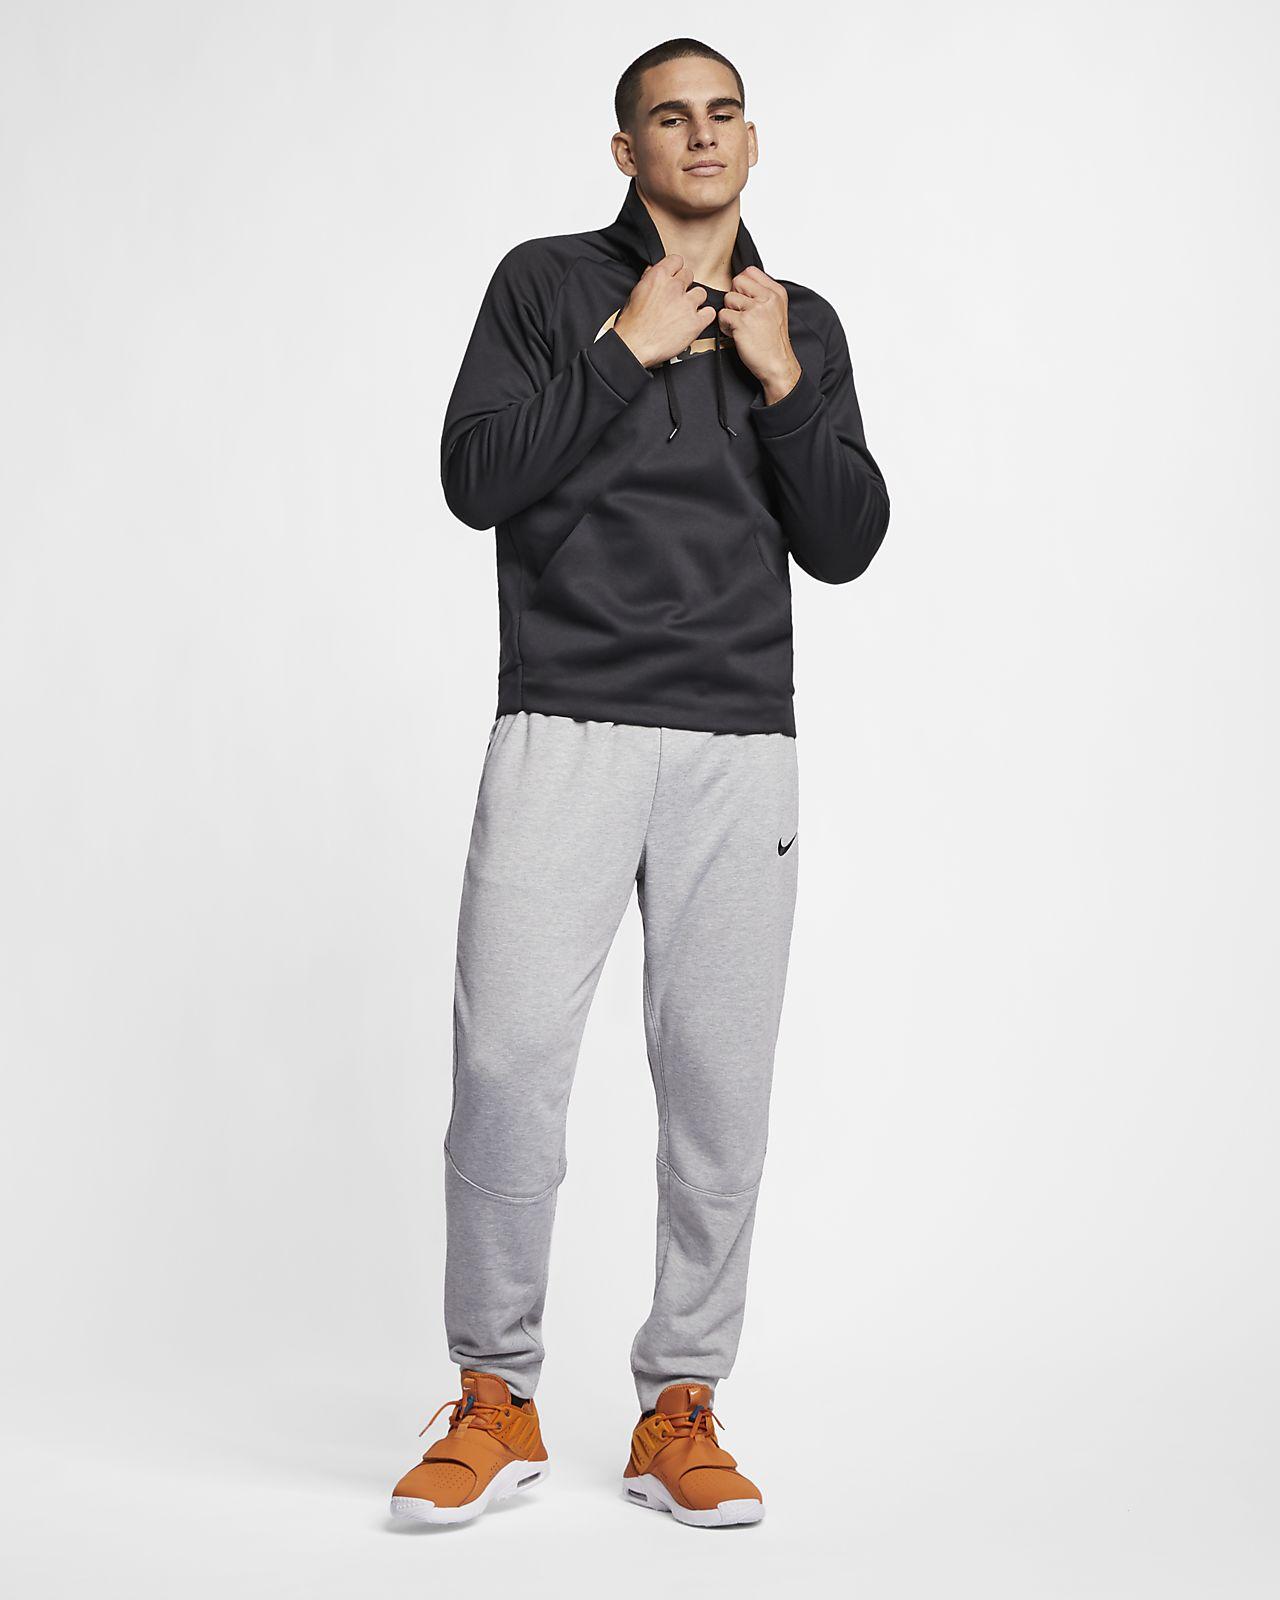 2e355c0b072422 Nike Dri-FIT schmal zulaufende Fleece-Trainingshose für Herren. Nike ...